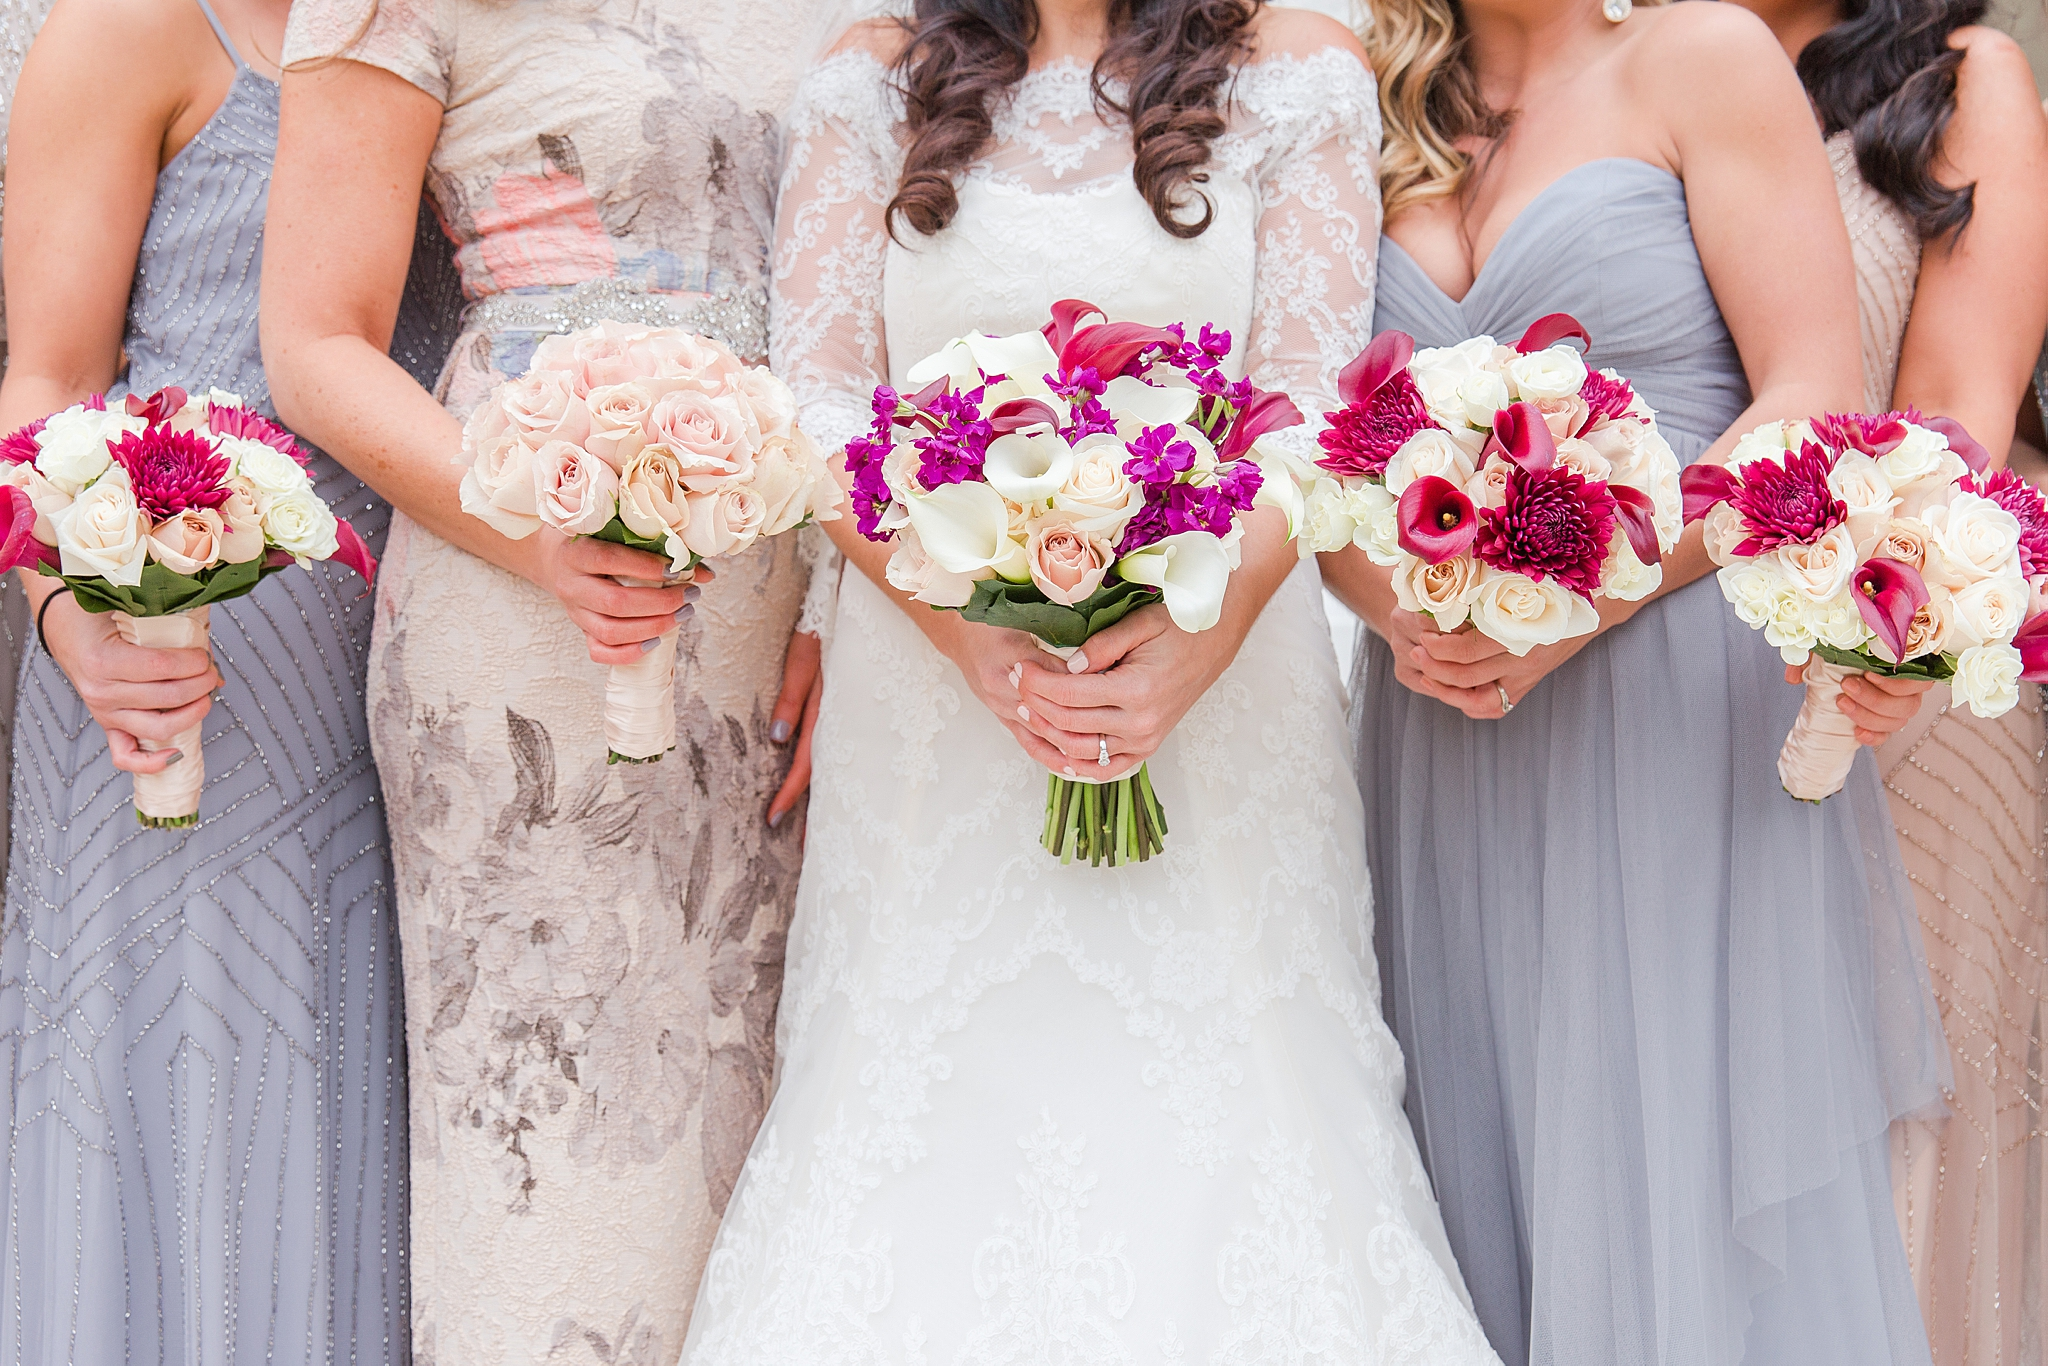 detroit-colony-club-wedding-regal-romantic-photography-in-detroit-mi-by-courtney-carolyn-photography_0003.jpg